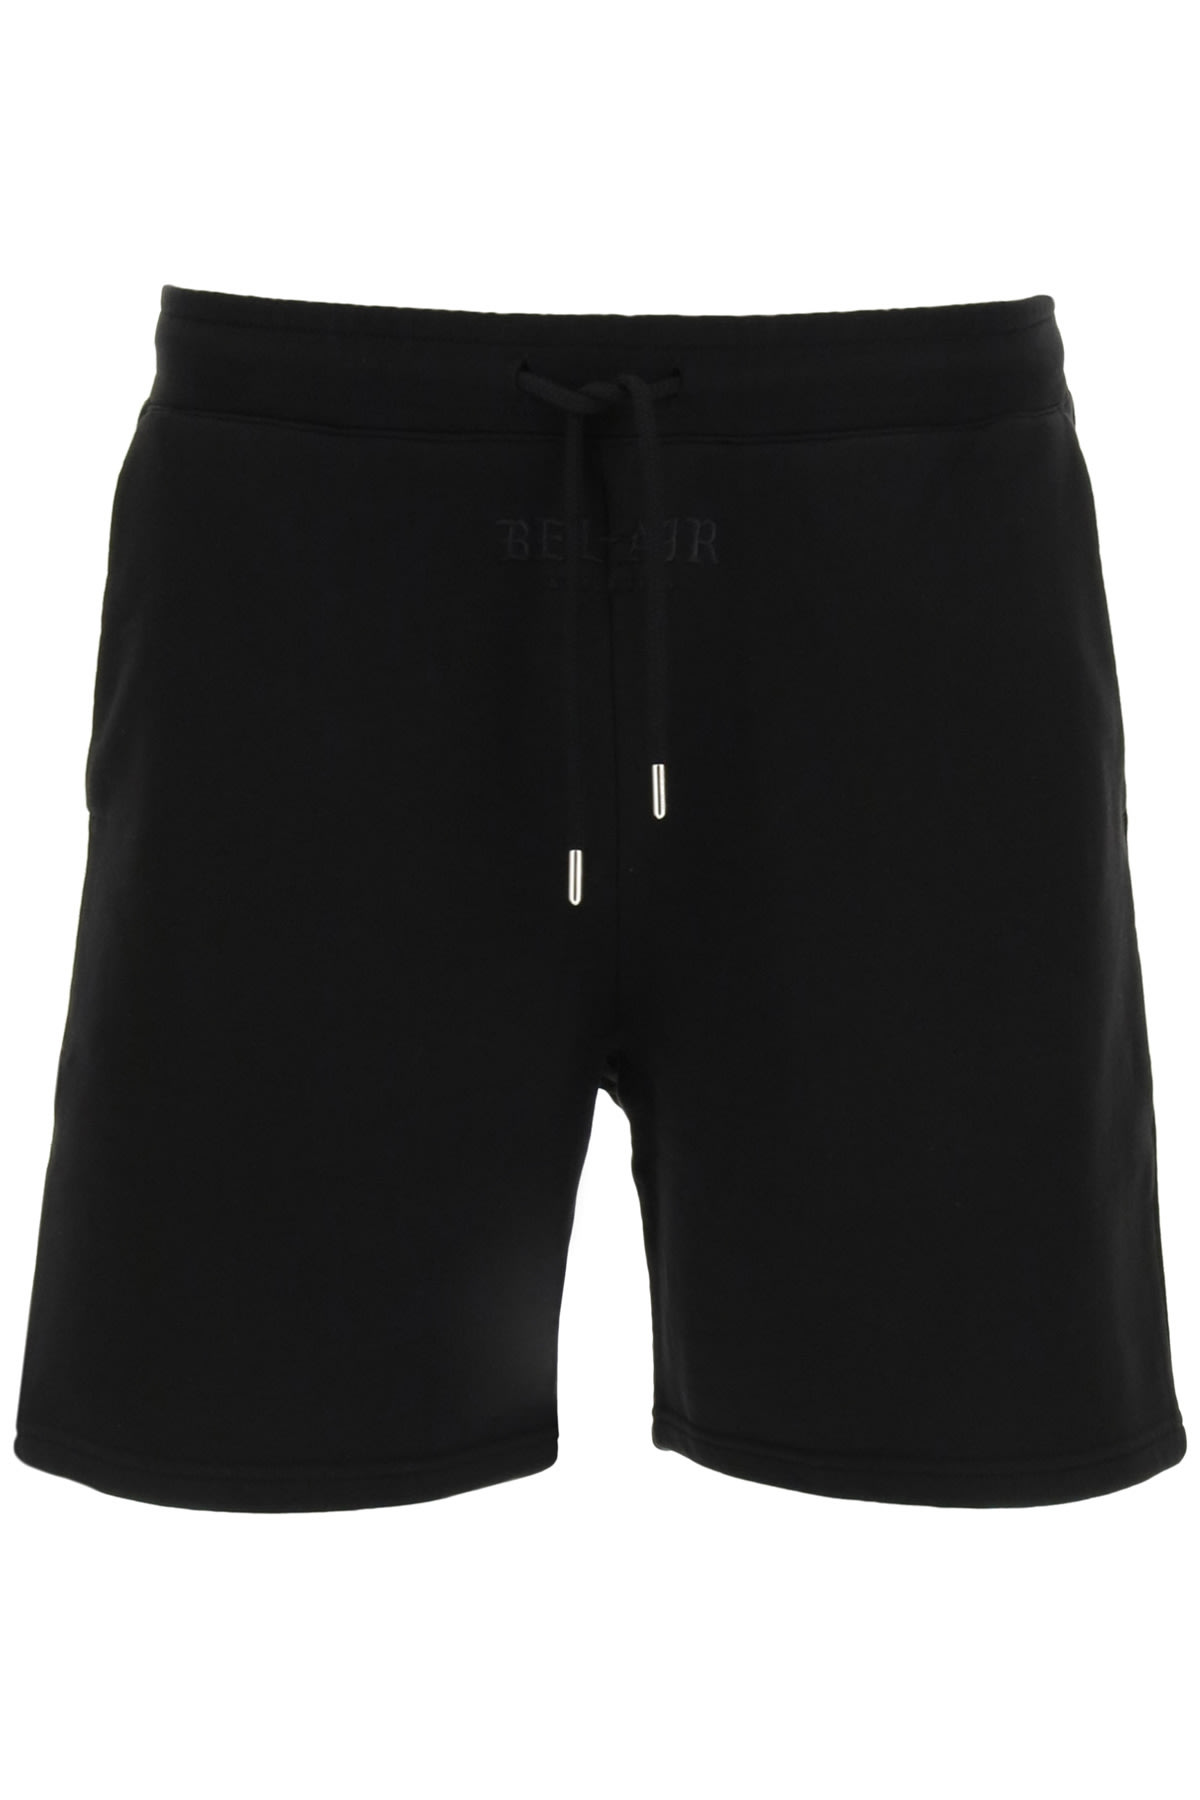 Gothic Font Sweat Shorts